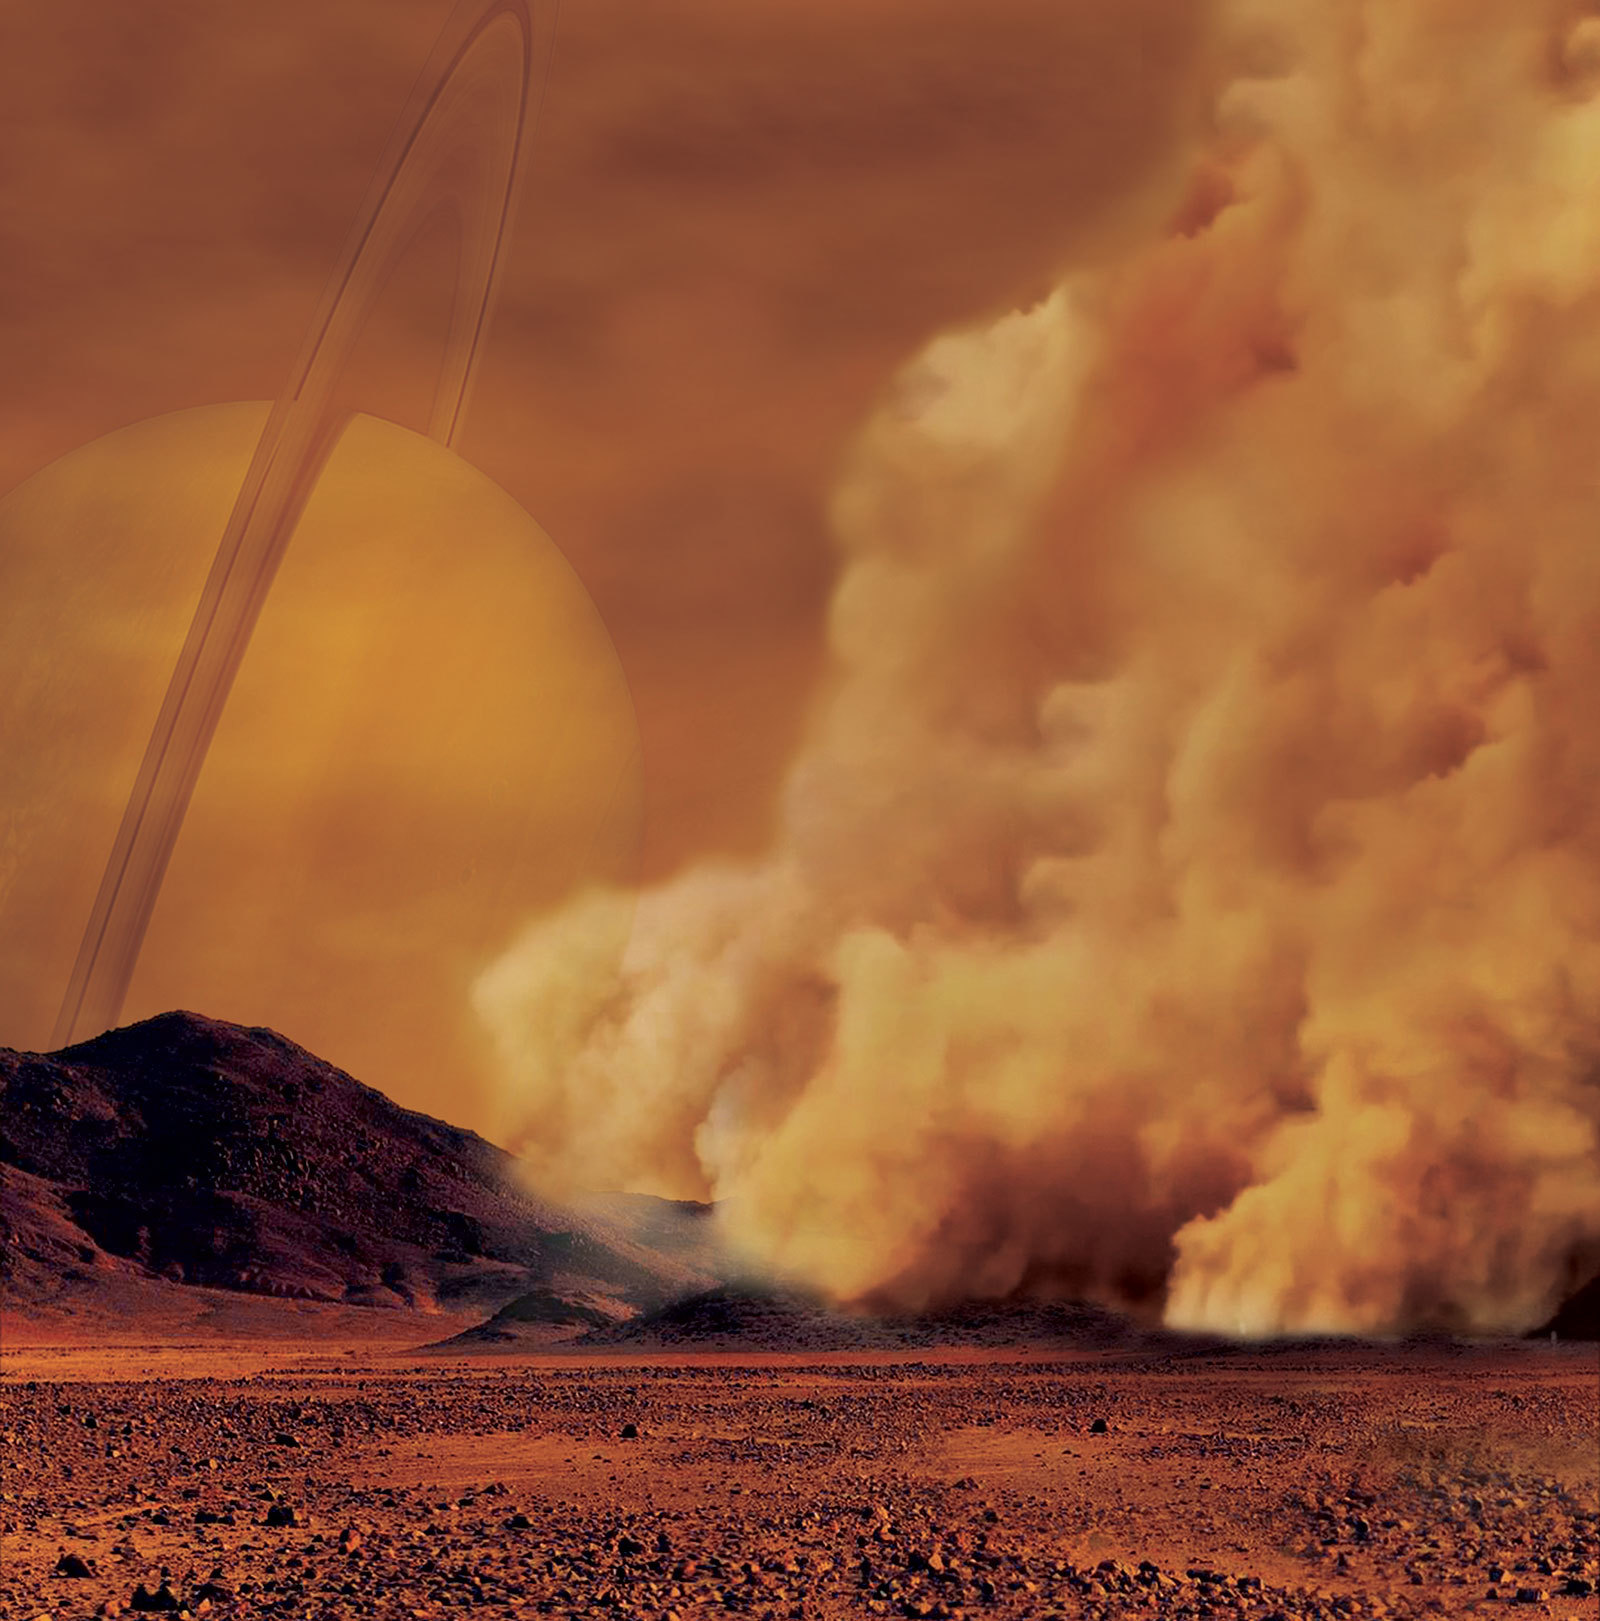 Heading to Titan? Bring a Swiffer!